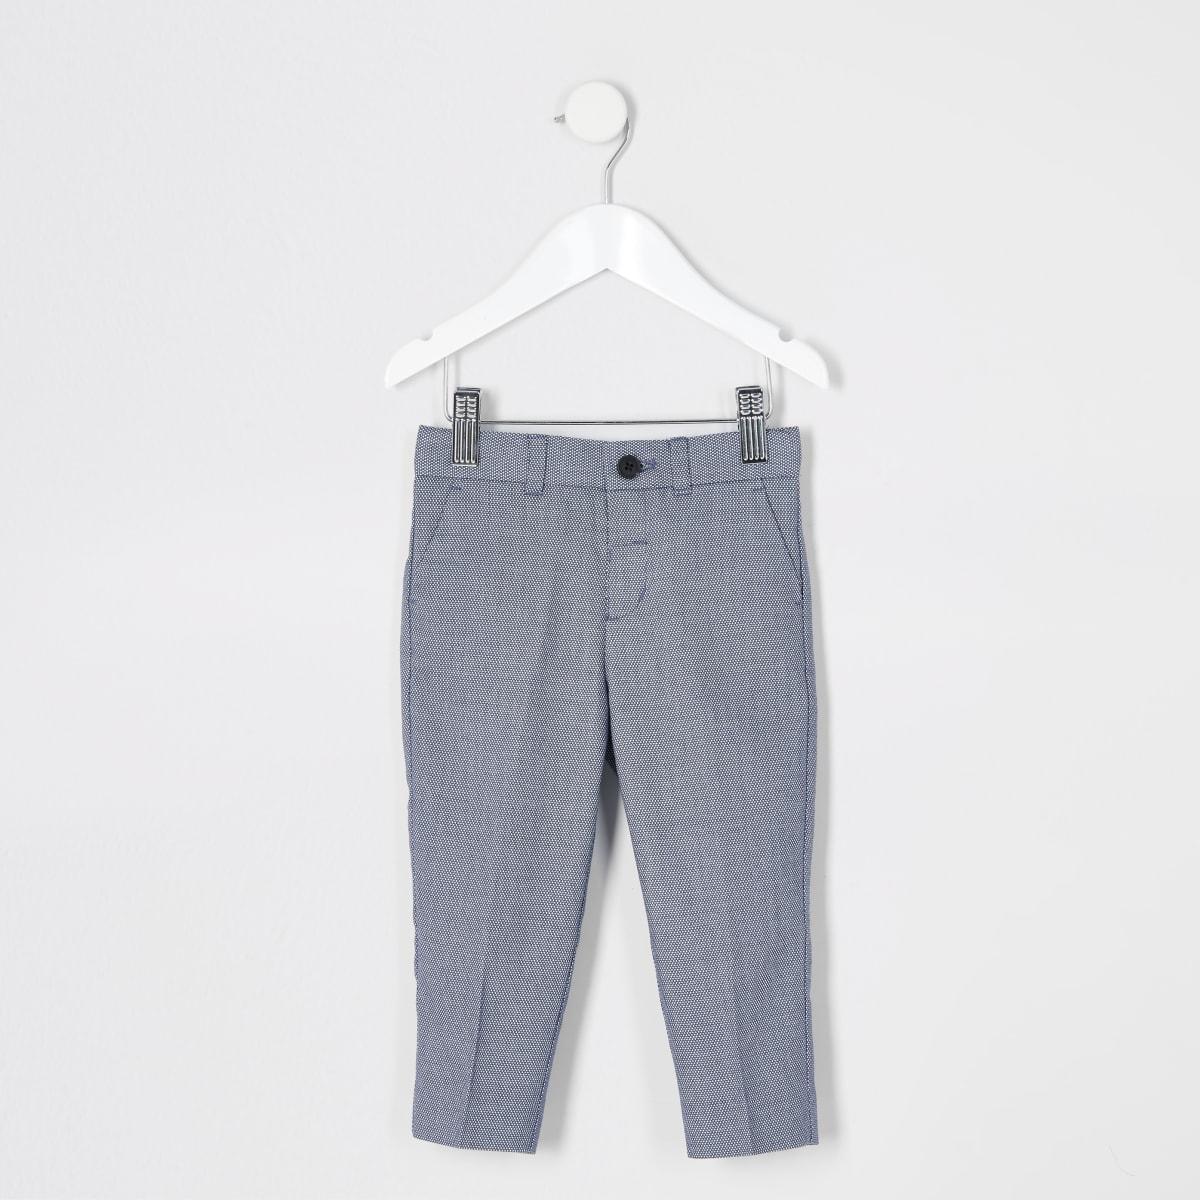 Pantalons de costumebleus à poistexturés Mini garçon